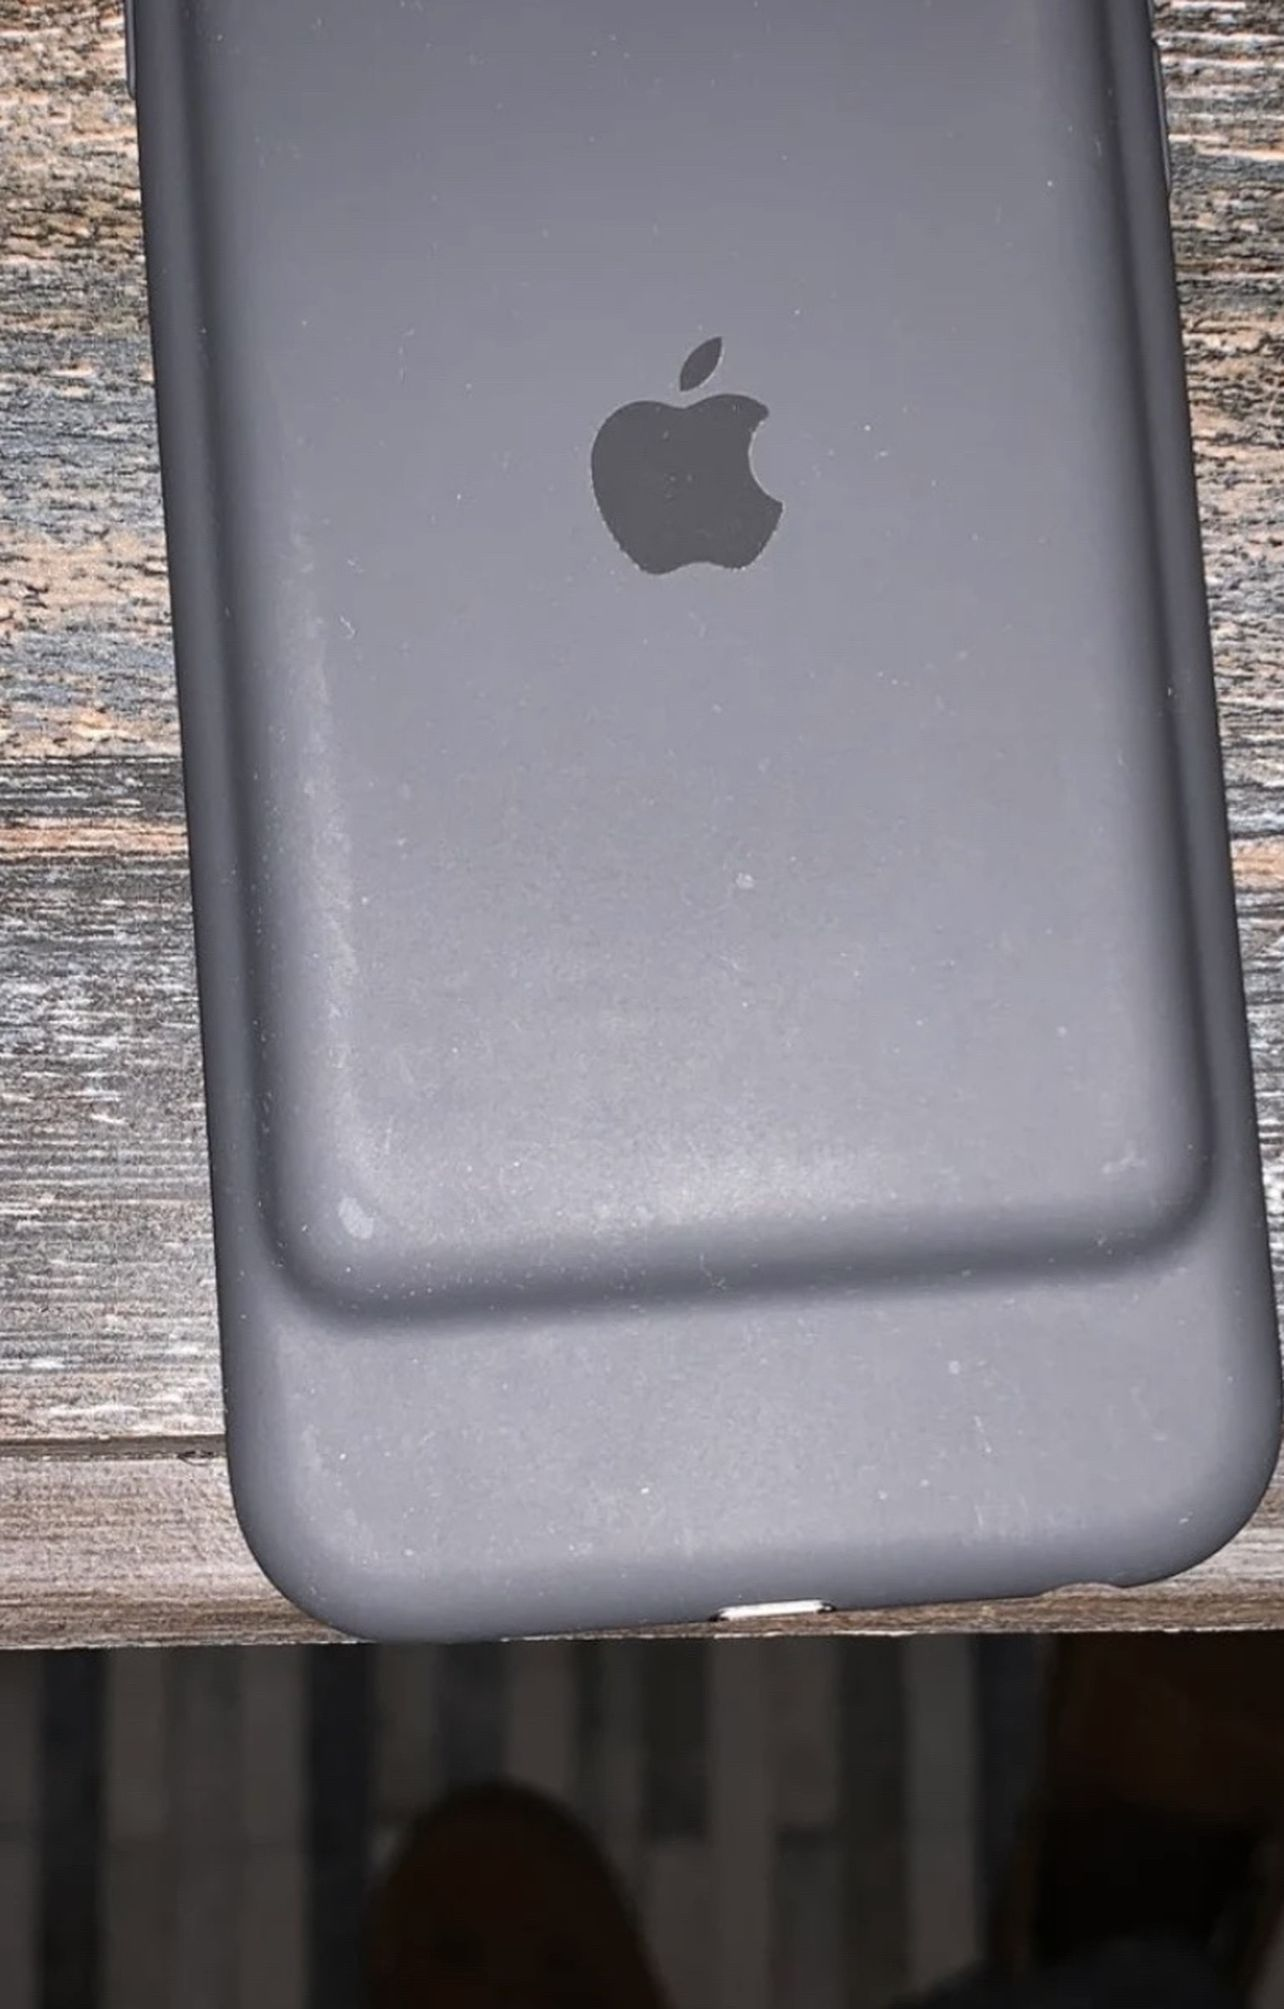 Apple Iphone 6s Charging Case